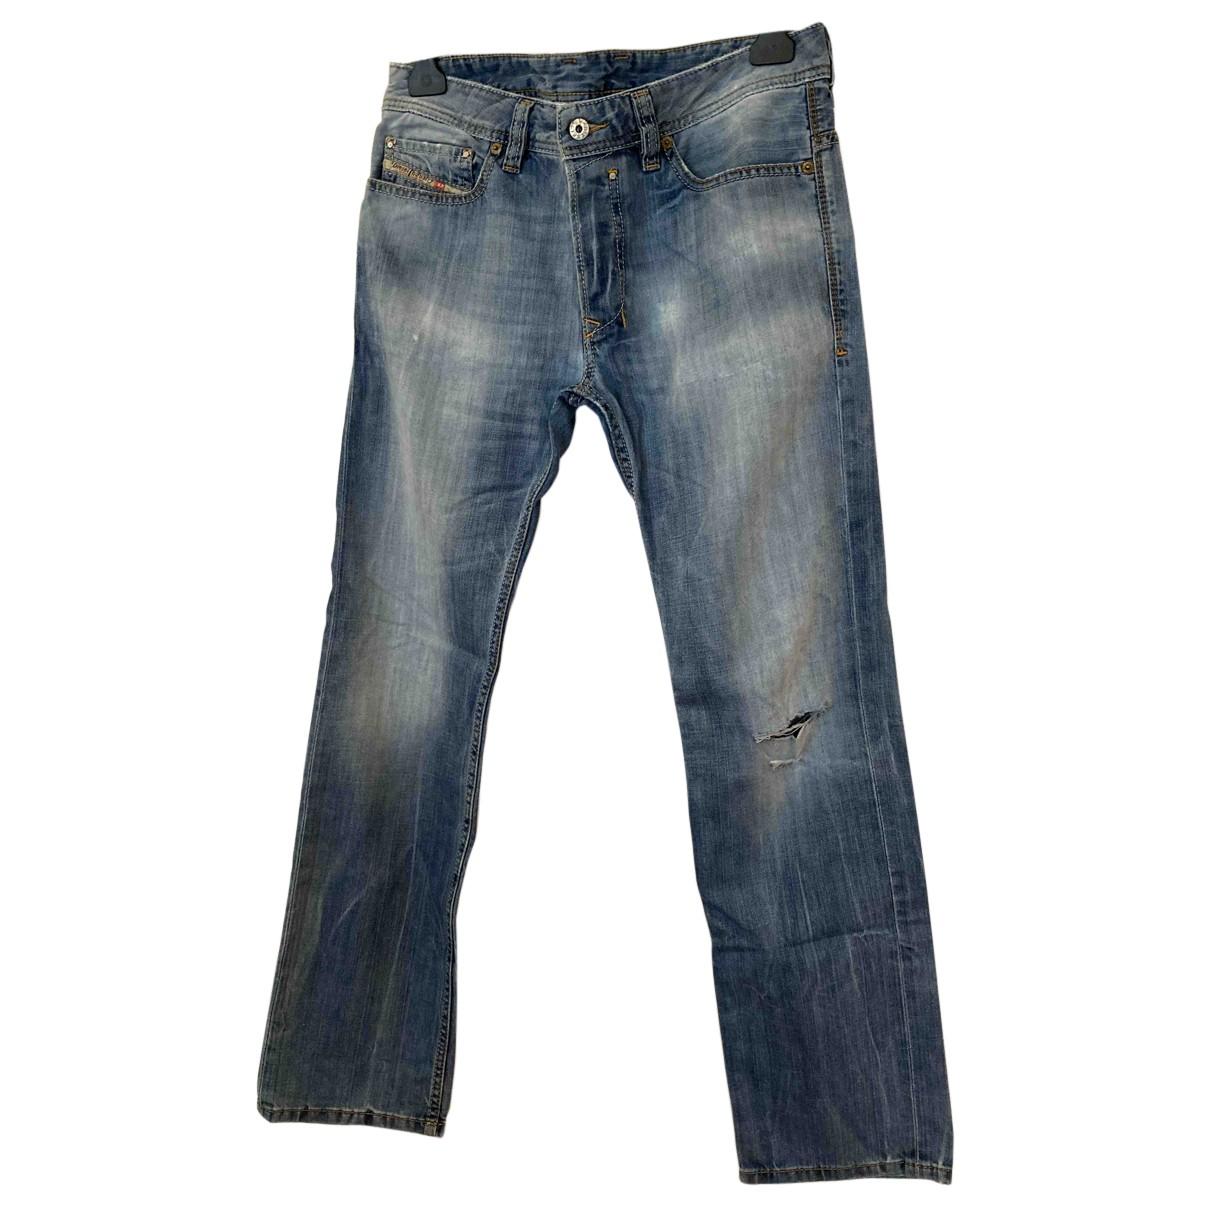 Diesel N Blue Denim - Jeans Jeans for Women 29 US